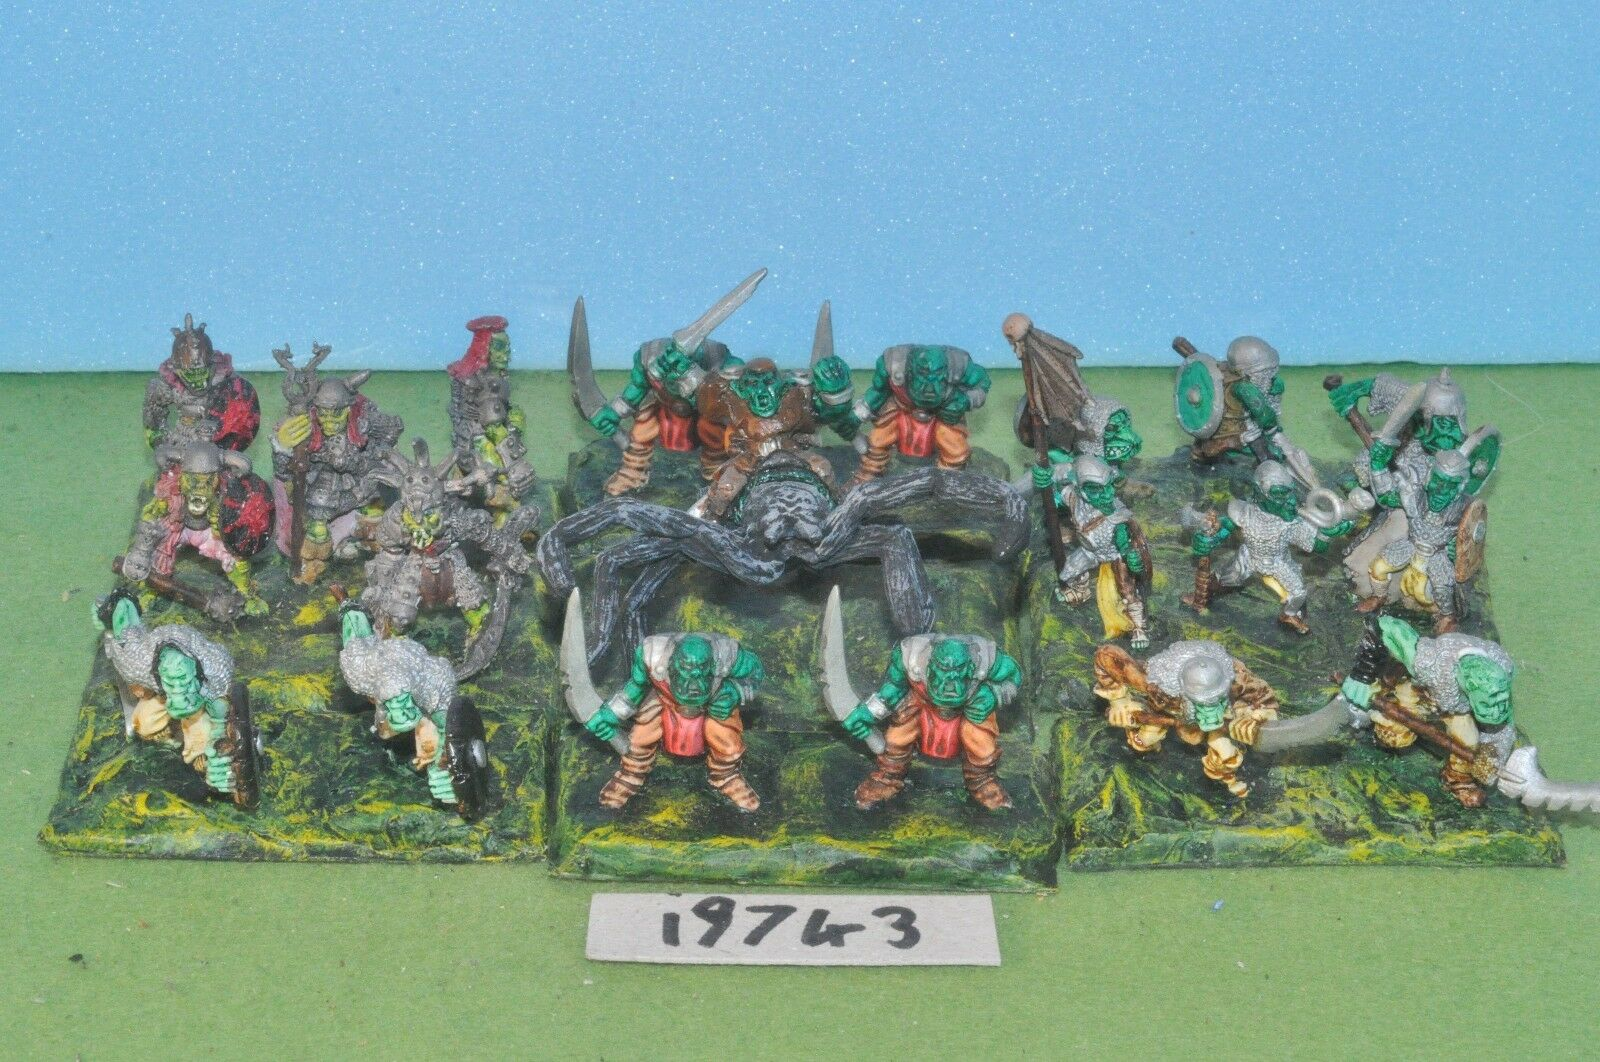 Item fantasy   warhammer - orc boys 19 metal & spider rider metal - (19743)